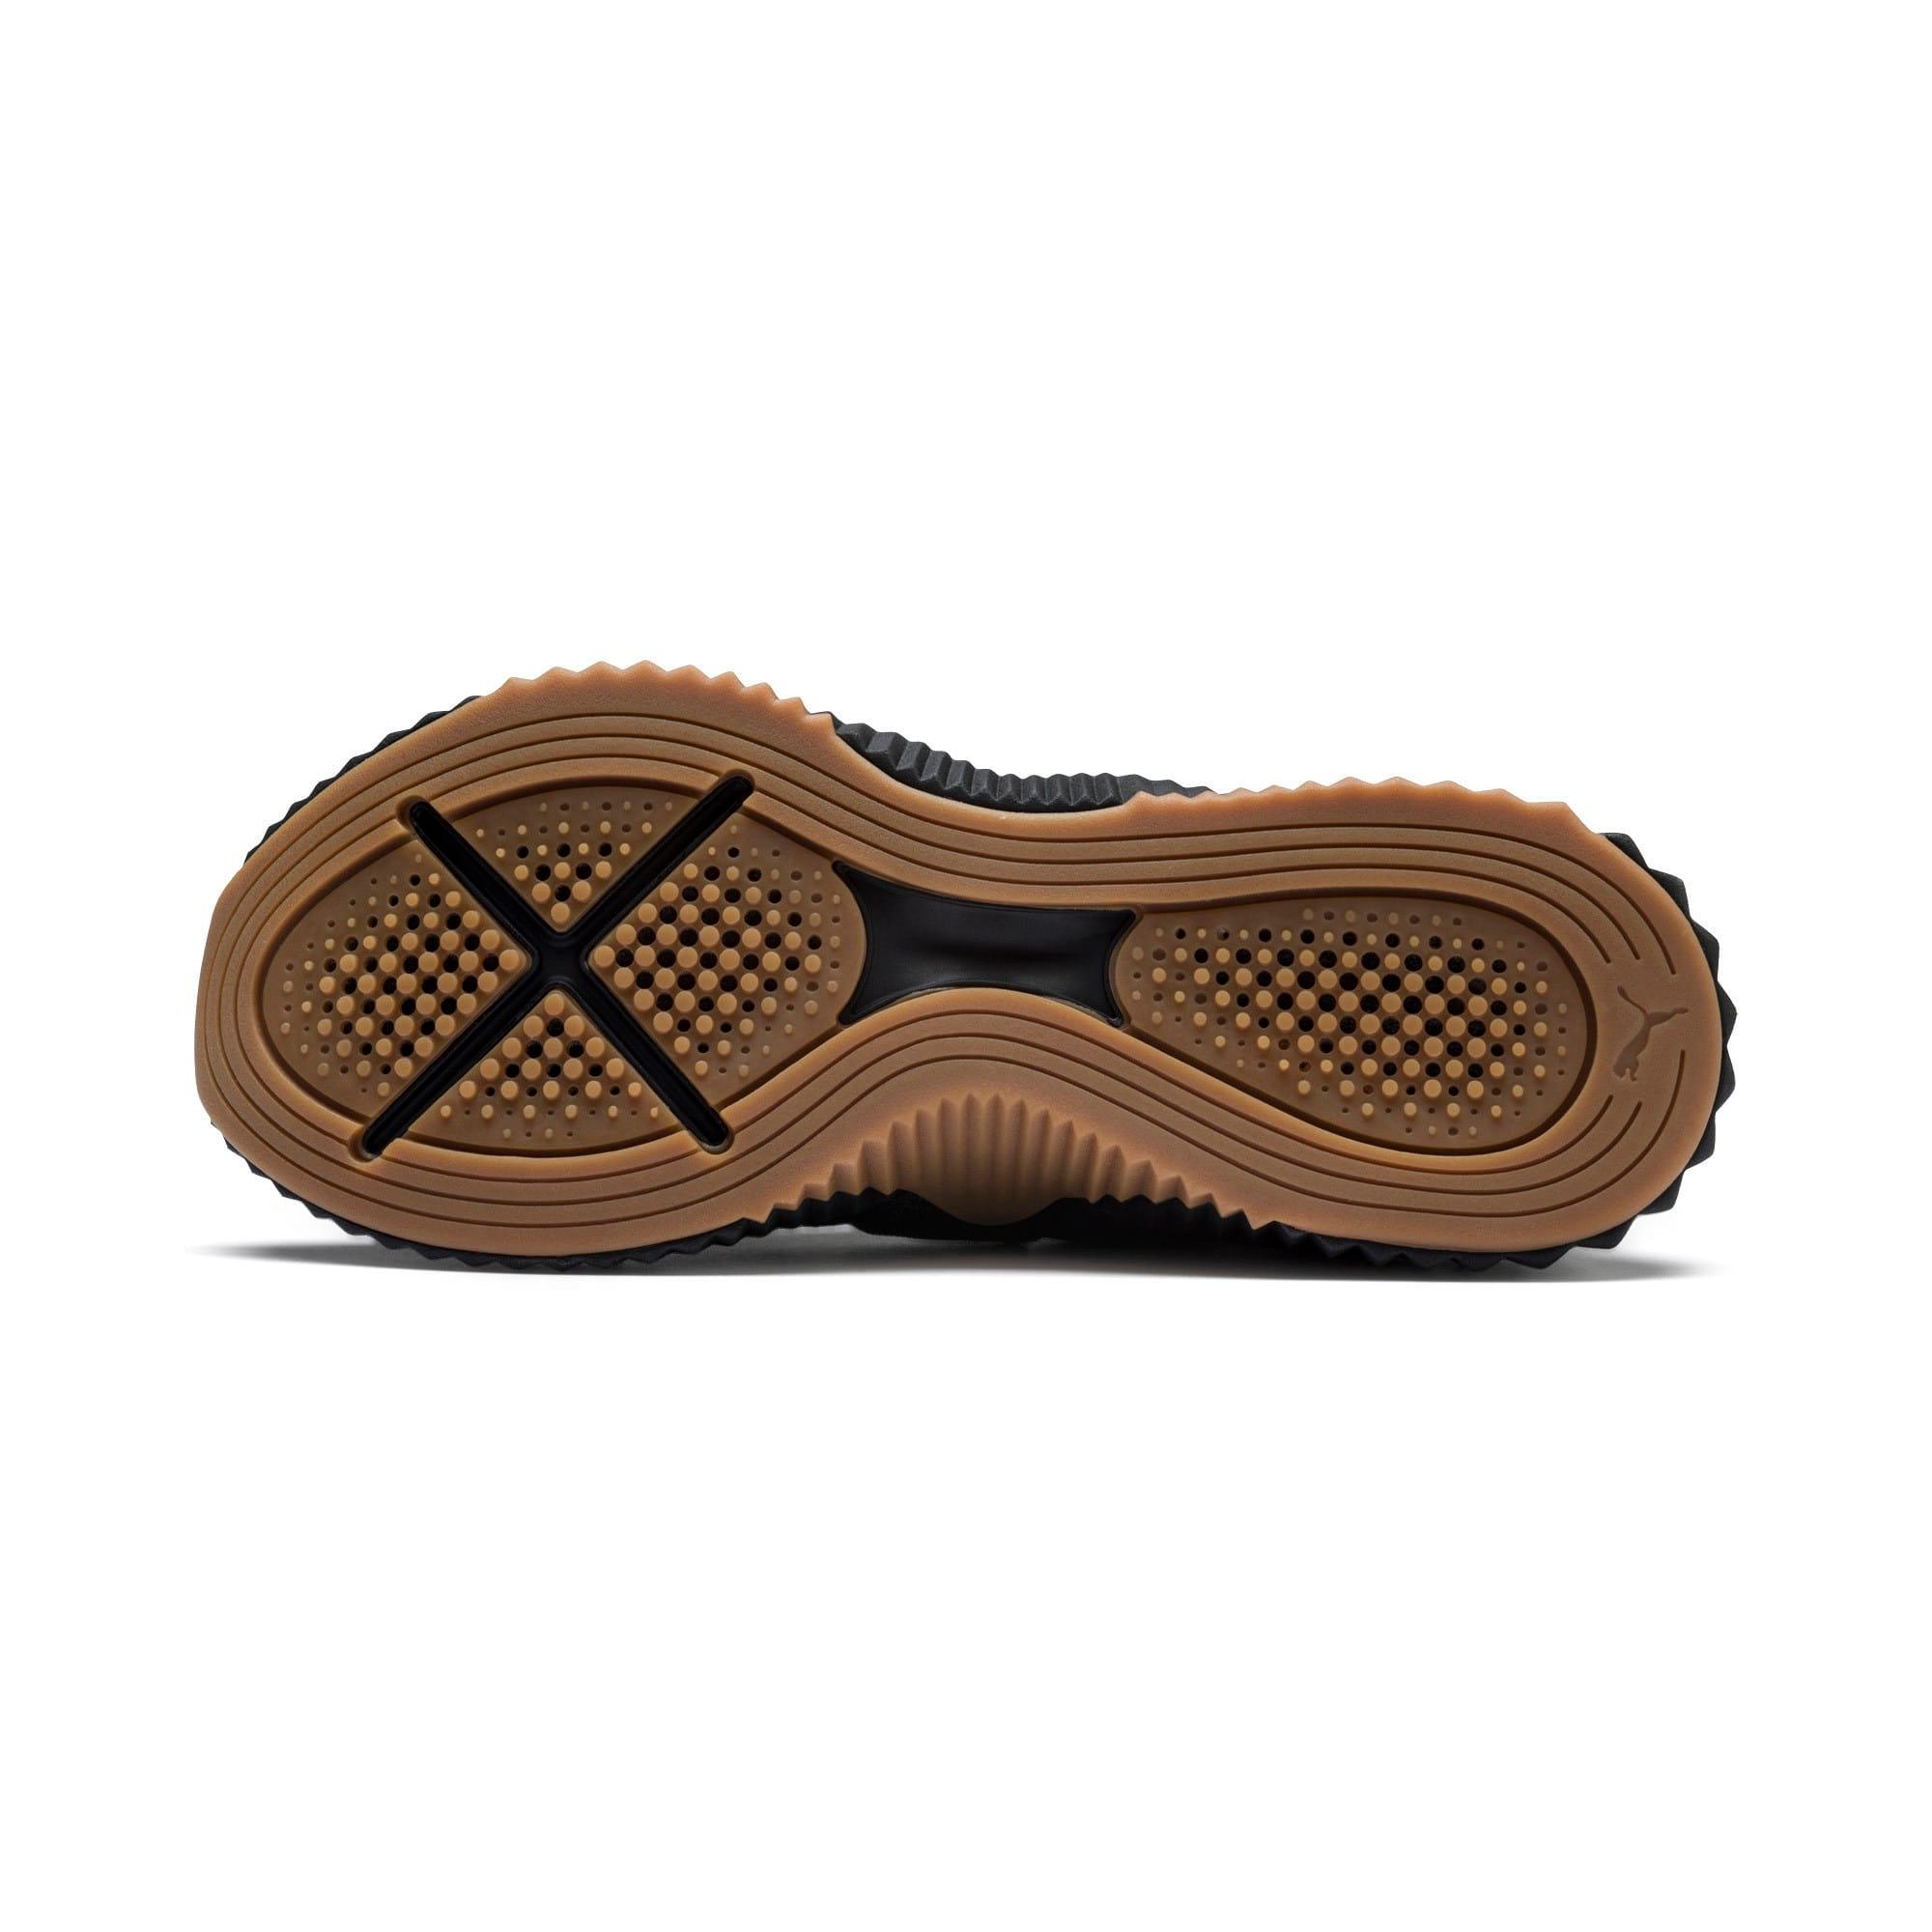 Thumbnail 5 of Defy Mid Sparkle Women's Training Shoes, Puma Black-Metallic Gold, medium